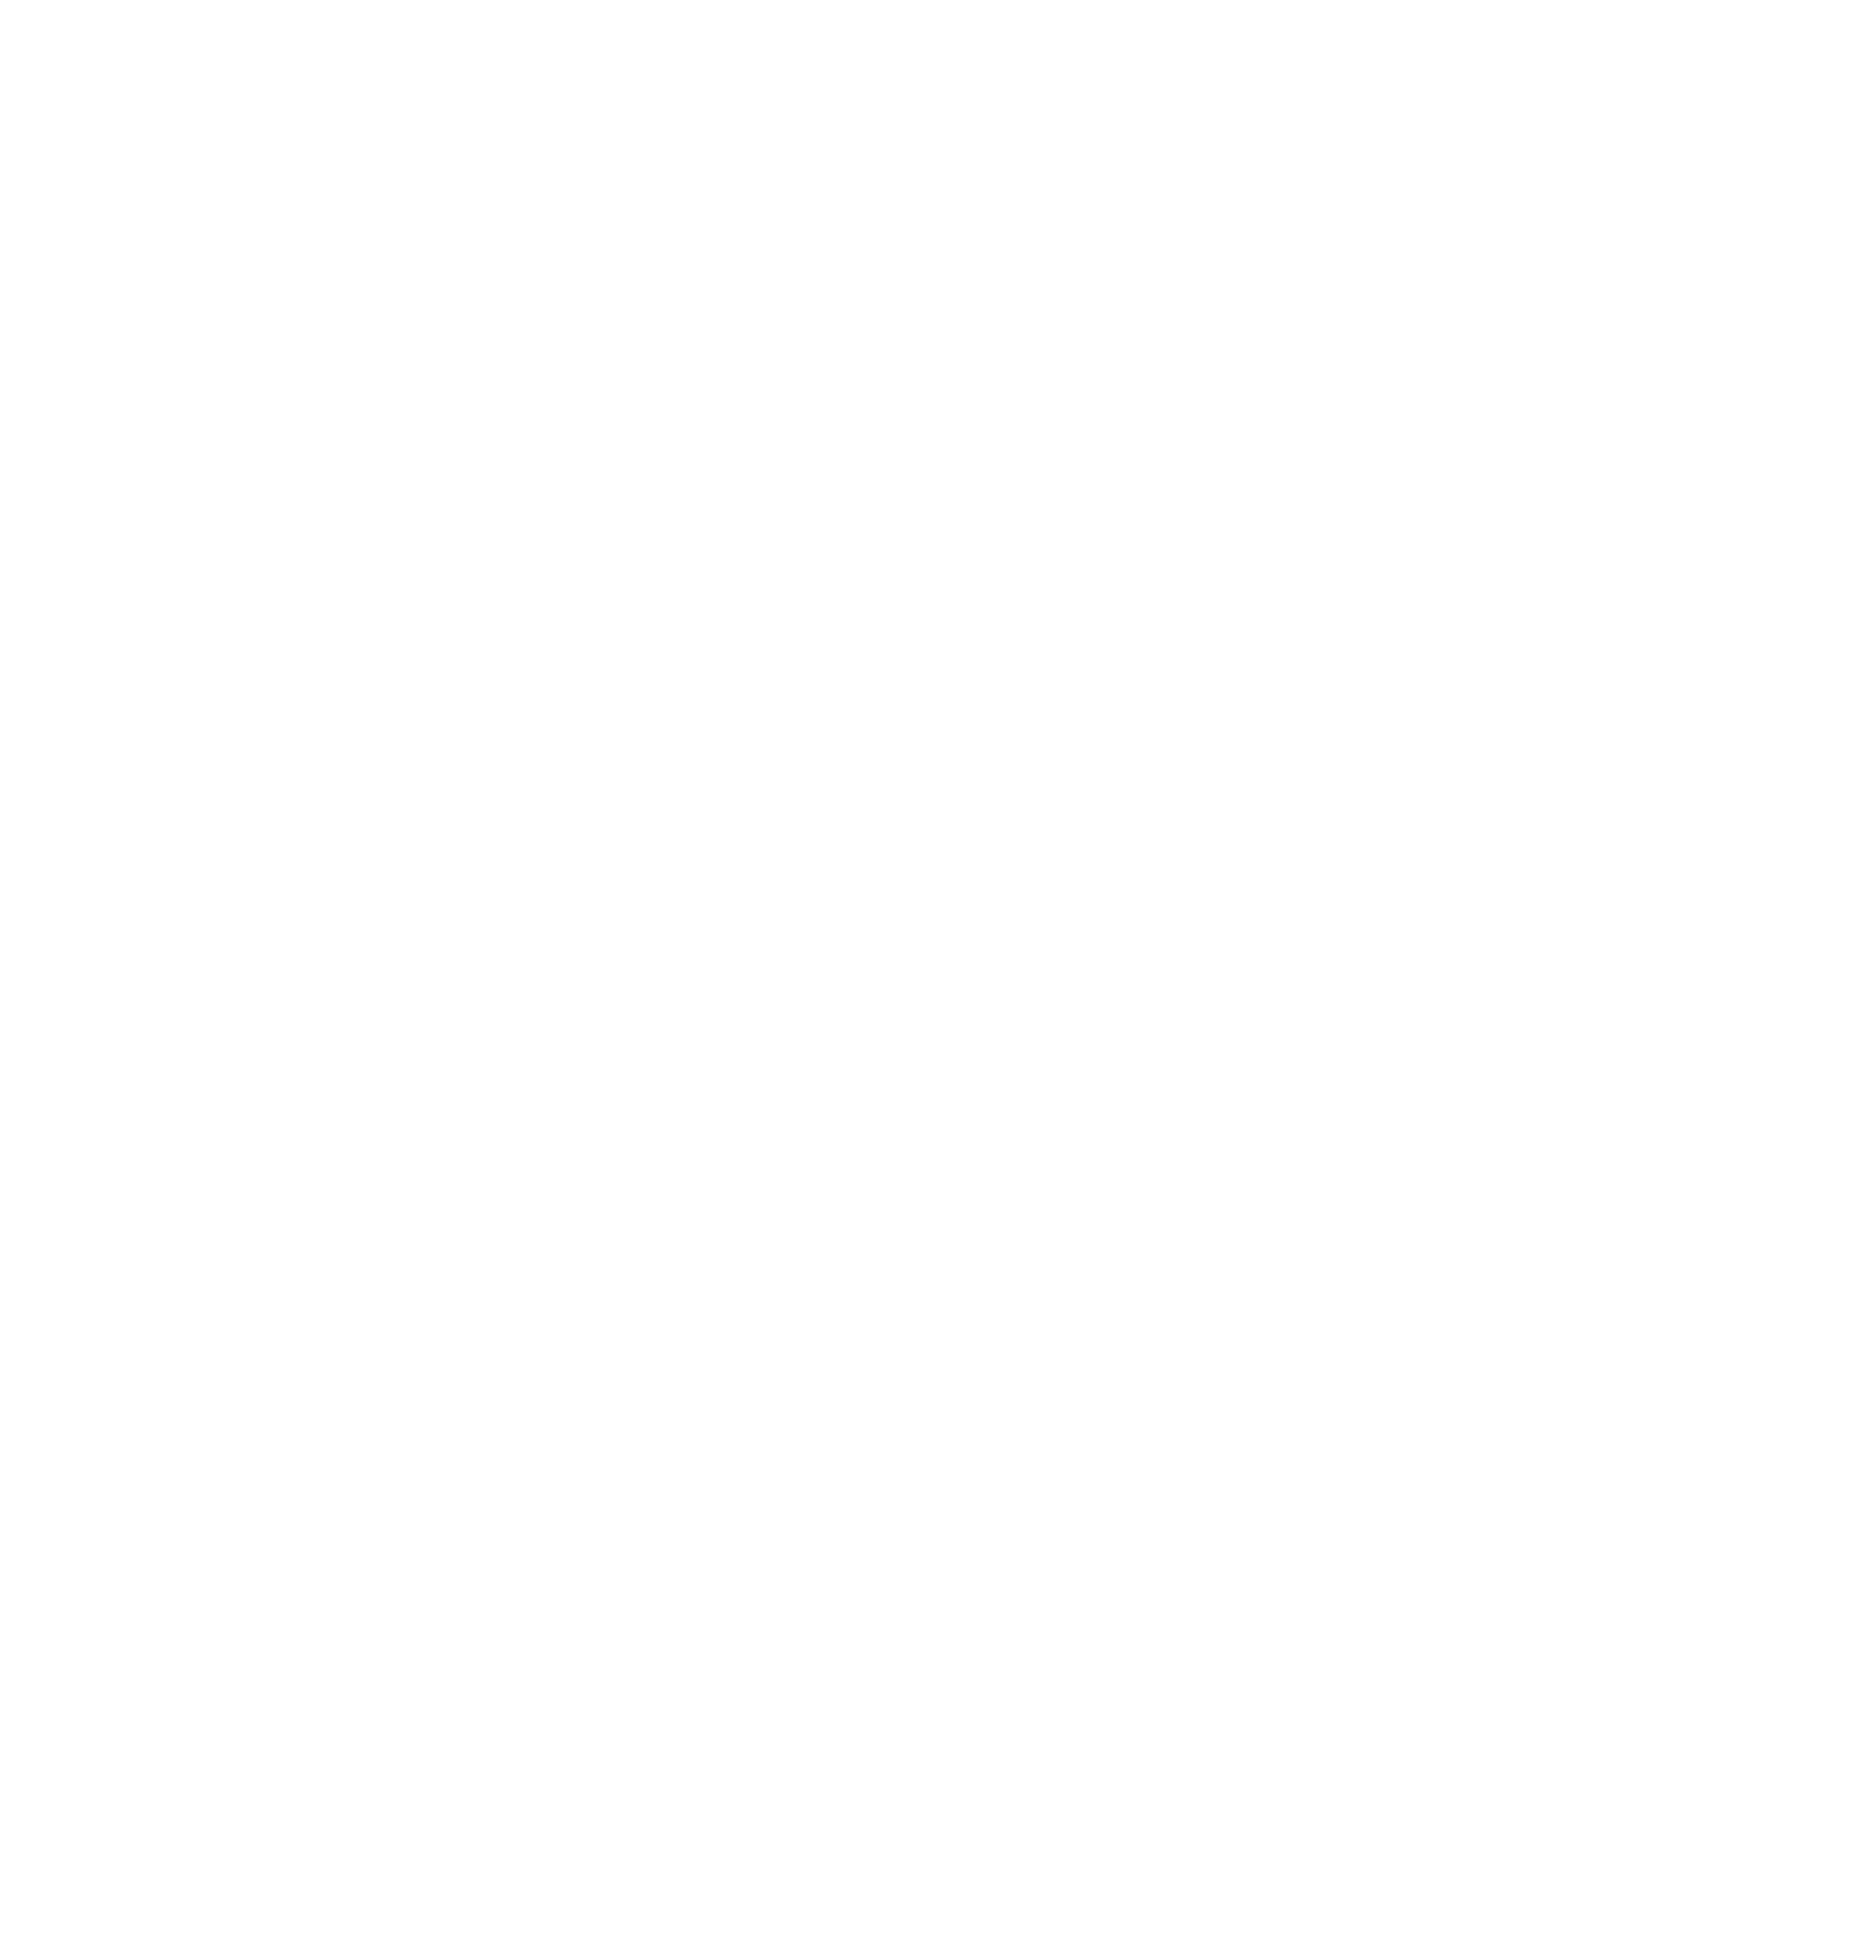 Sibirica 800mm x 800mm